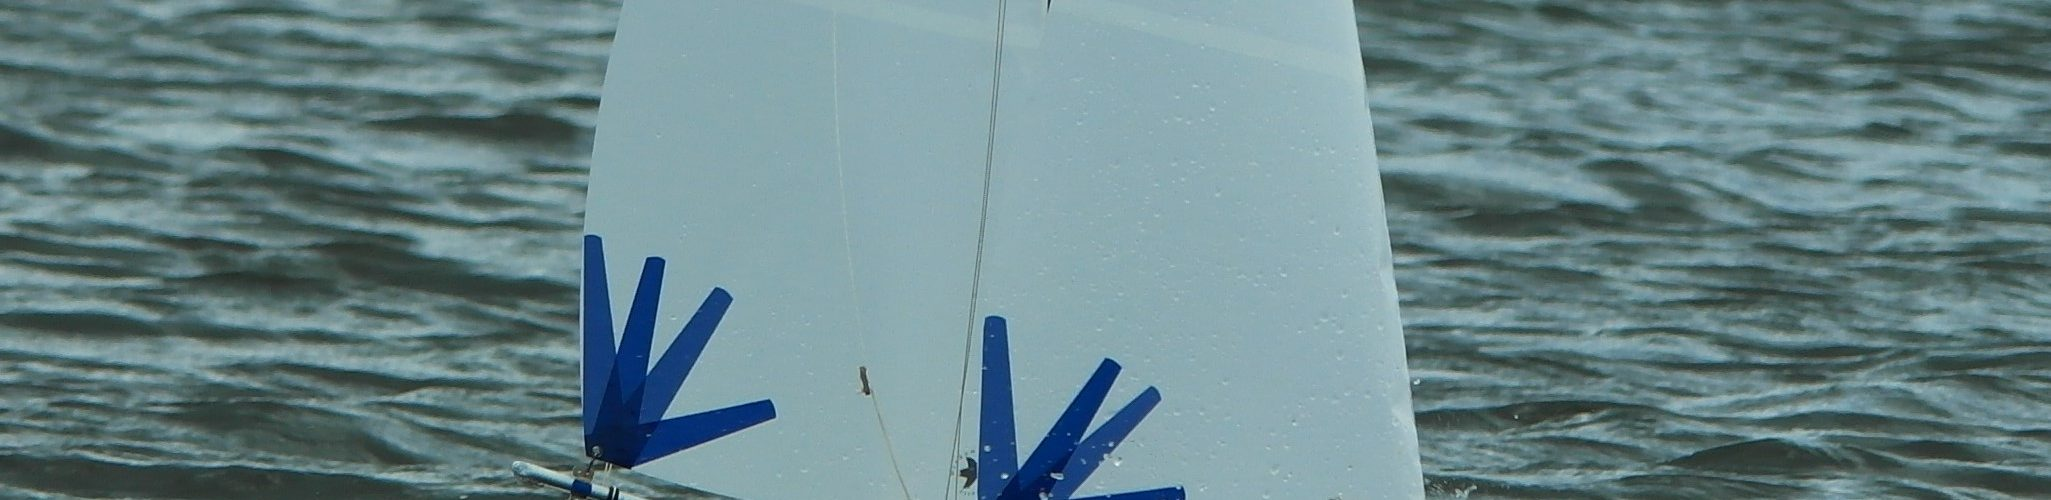 Radio controlled model sailing yacht